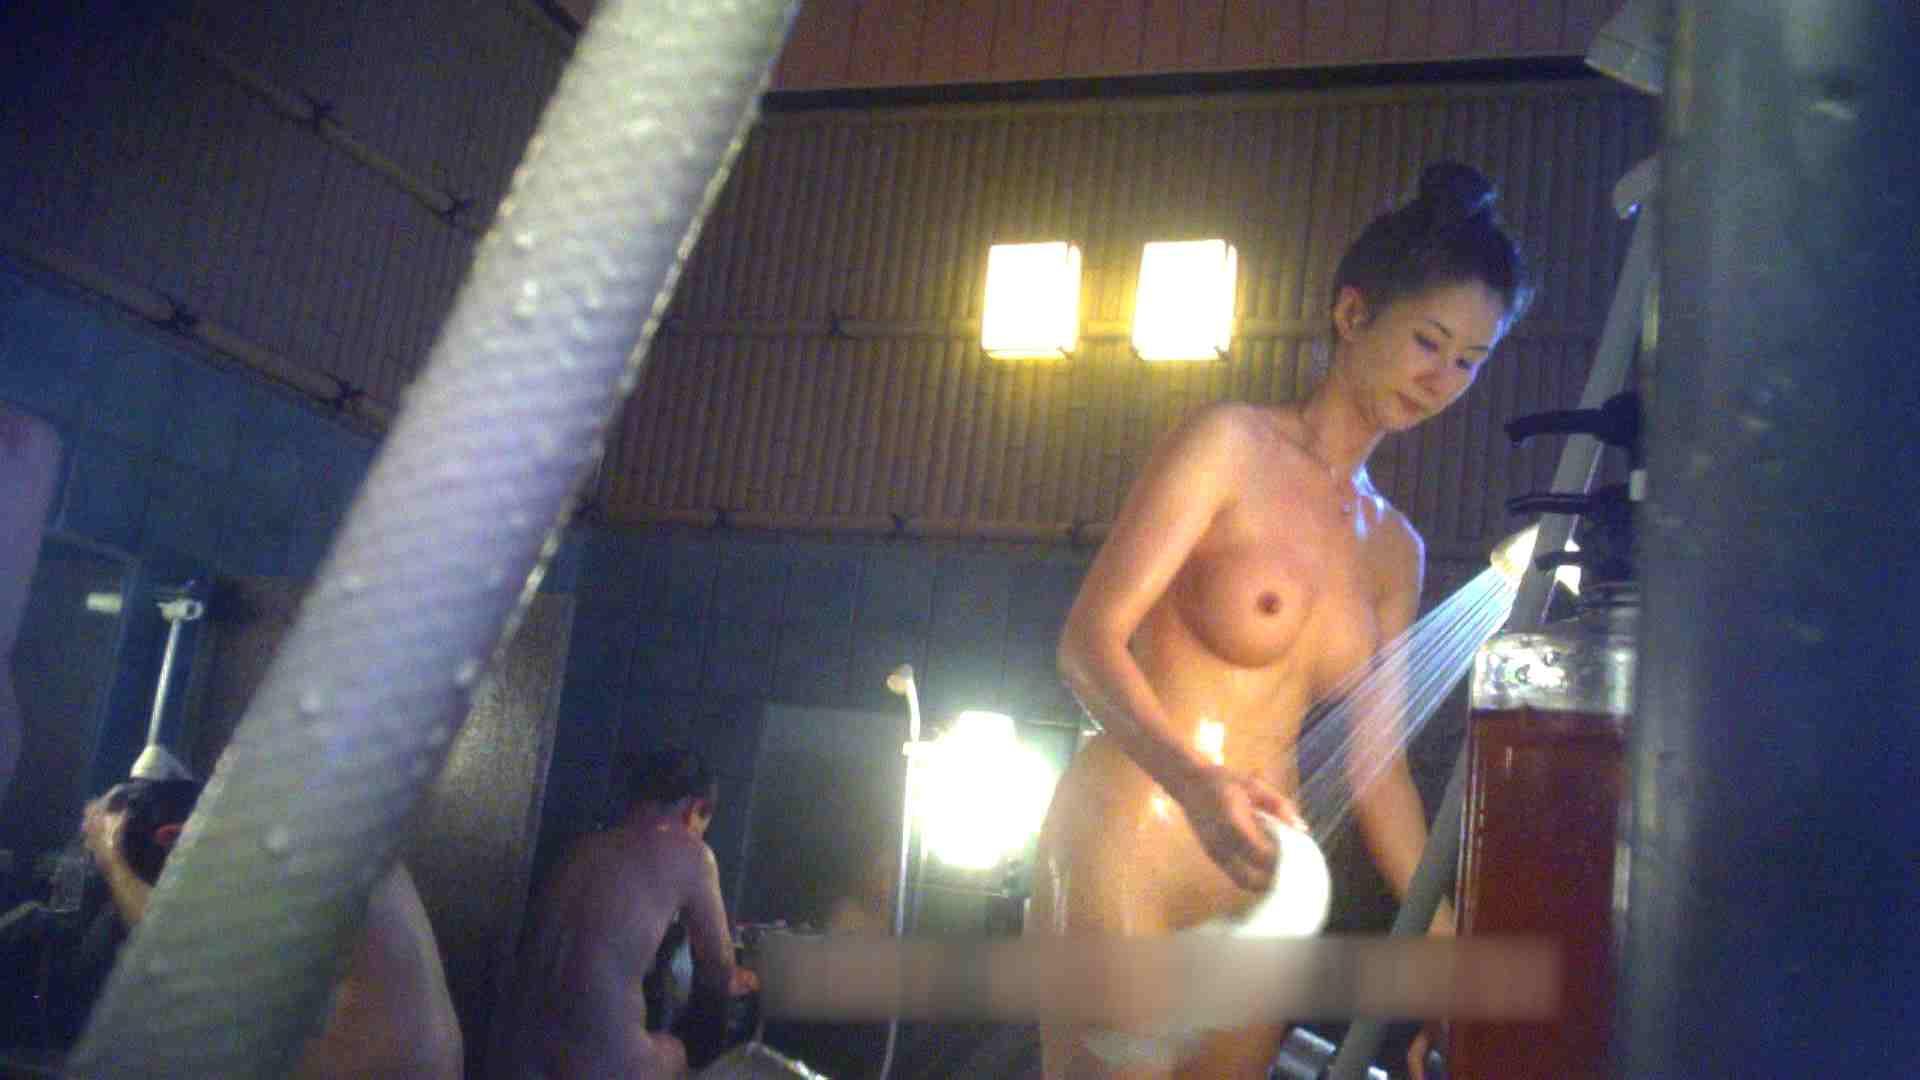 TG.15 【上等兵】高級旅館の爆乳女将で有名っぽい 潜入  86pic 21